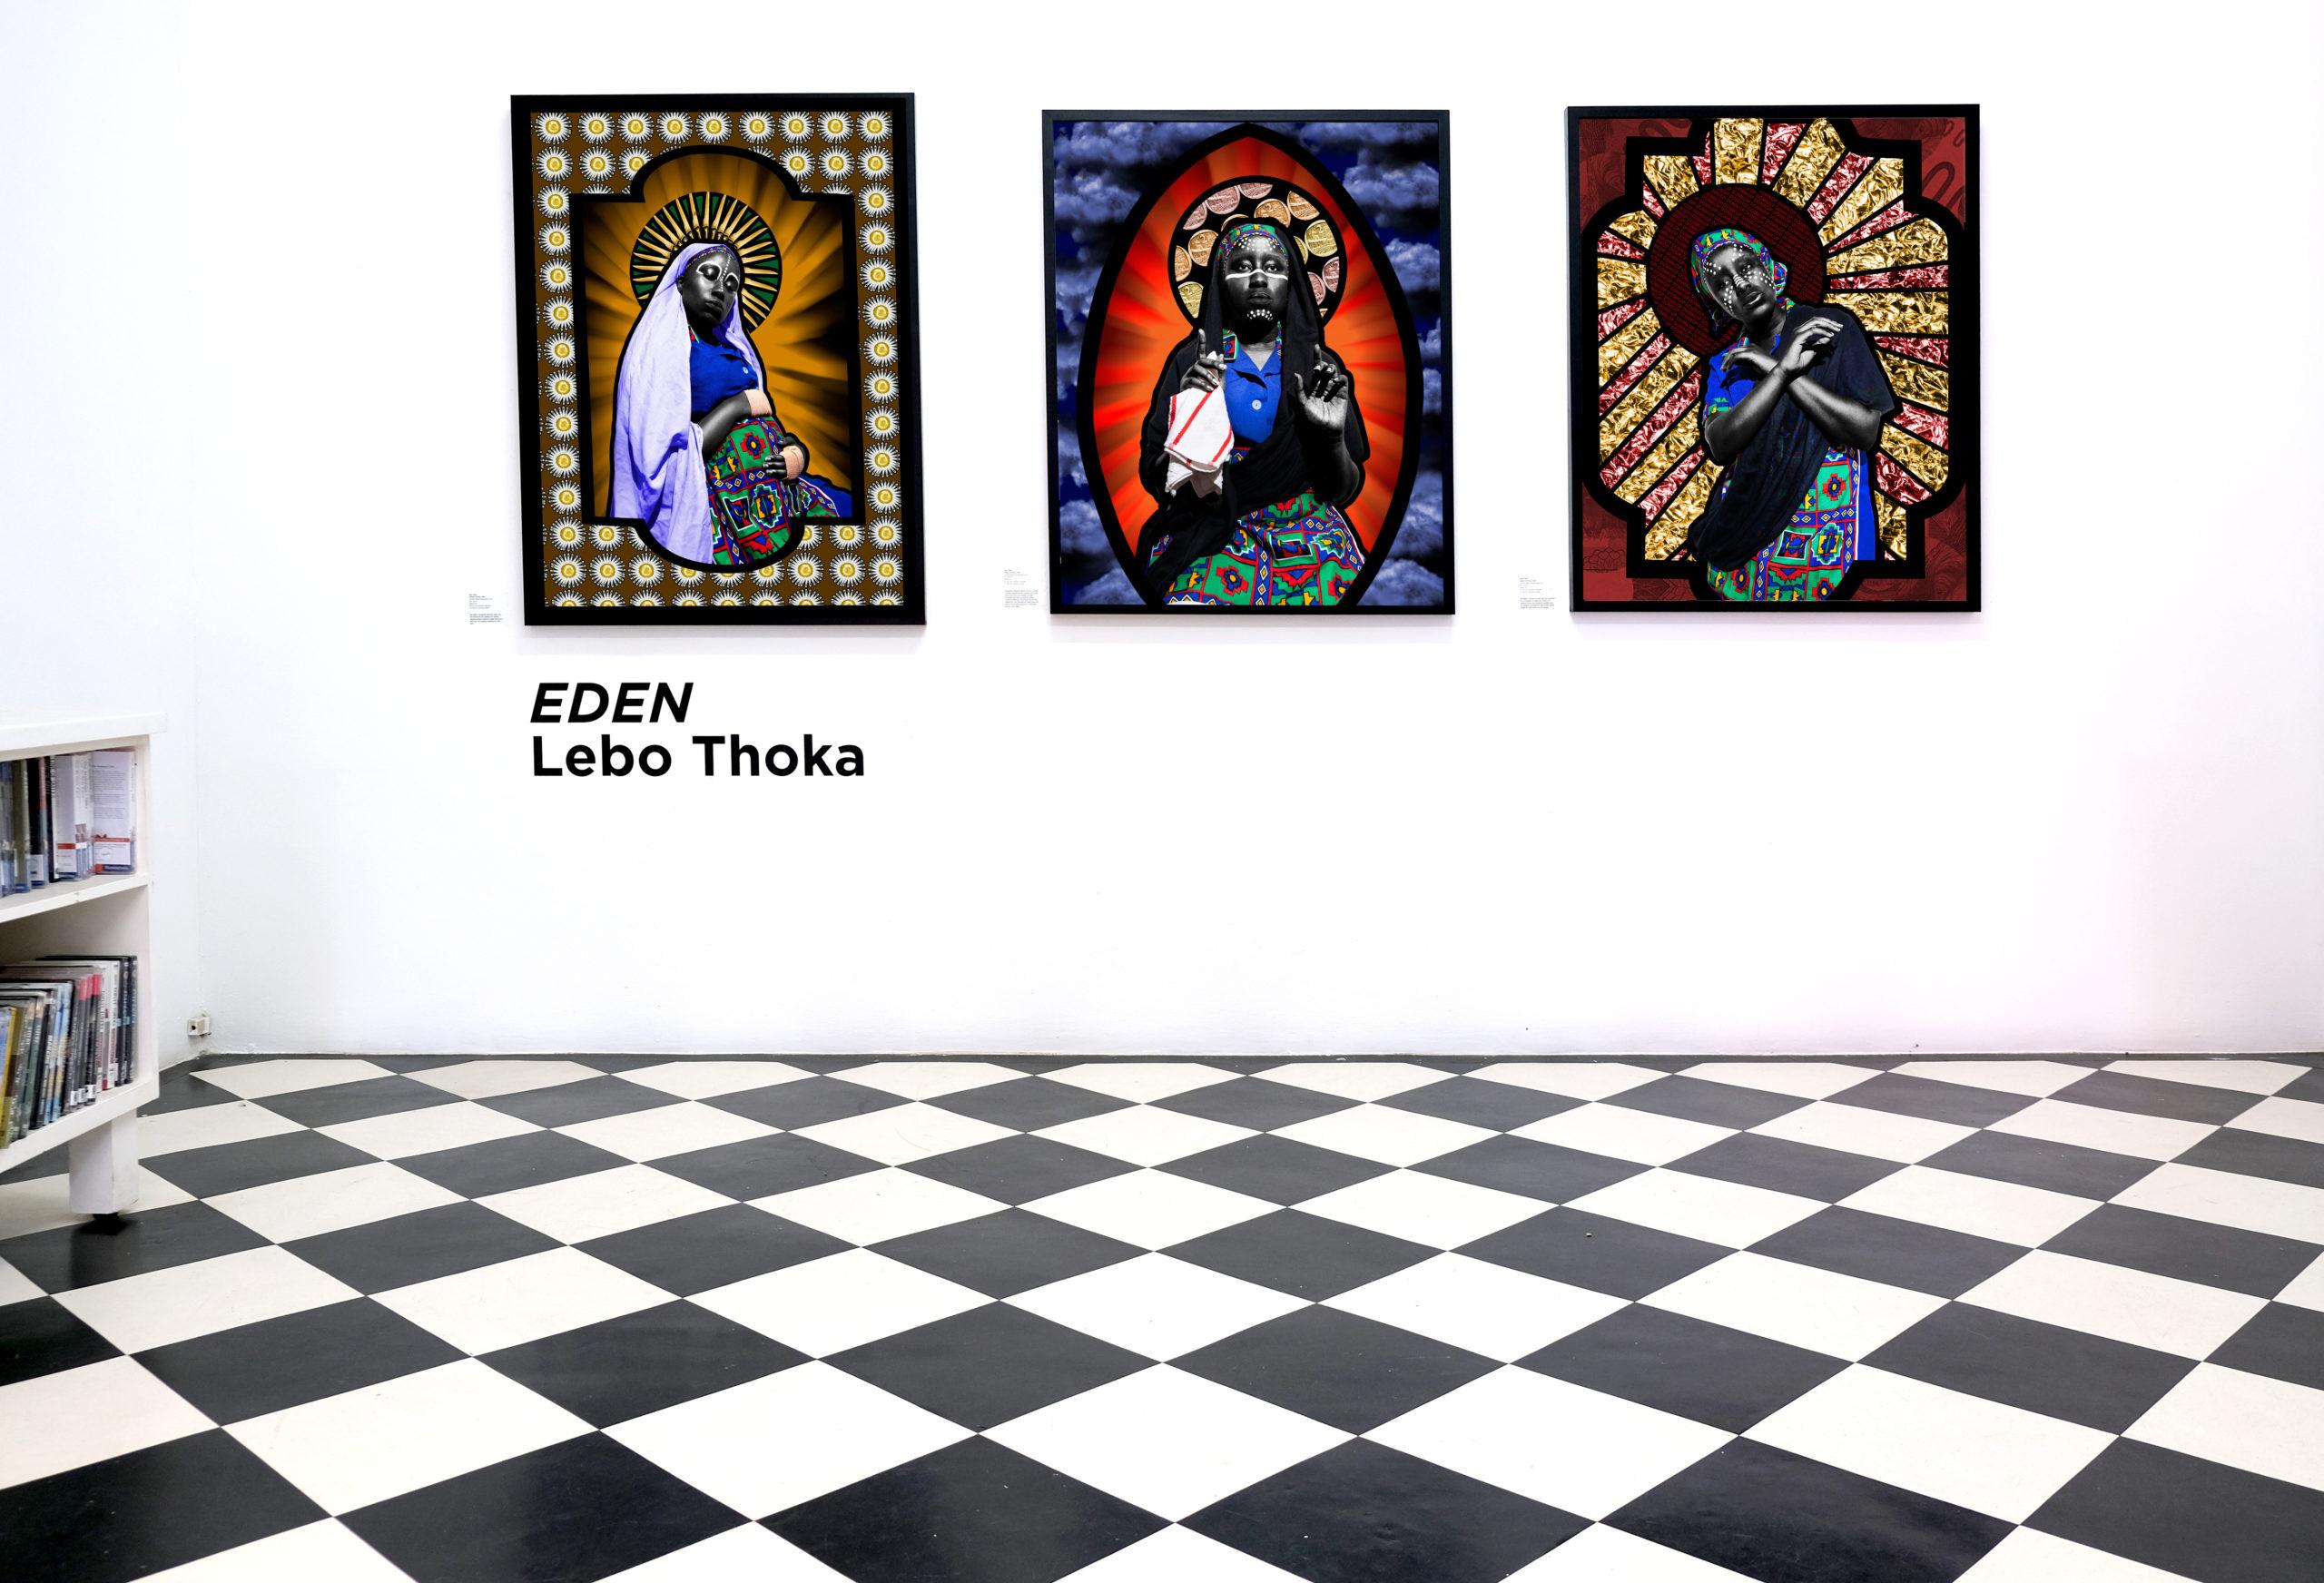 EDEN by Lebo Thoka on show at David Krut Projects Johannesburg